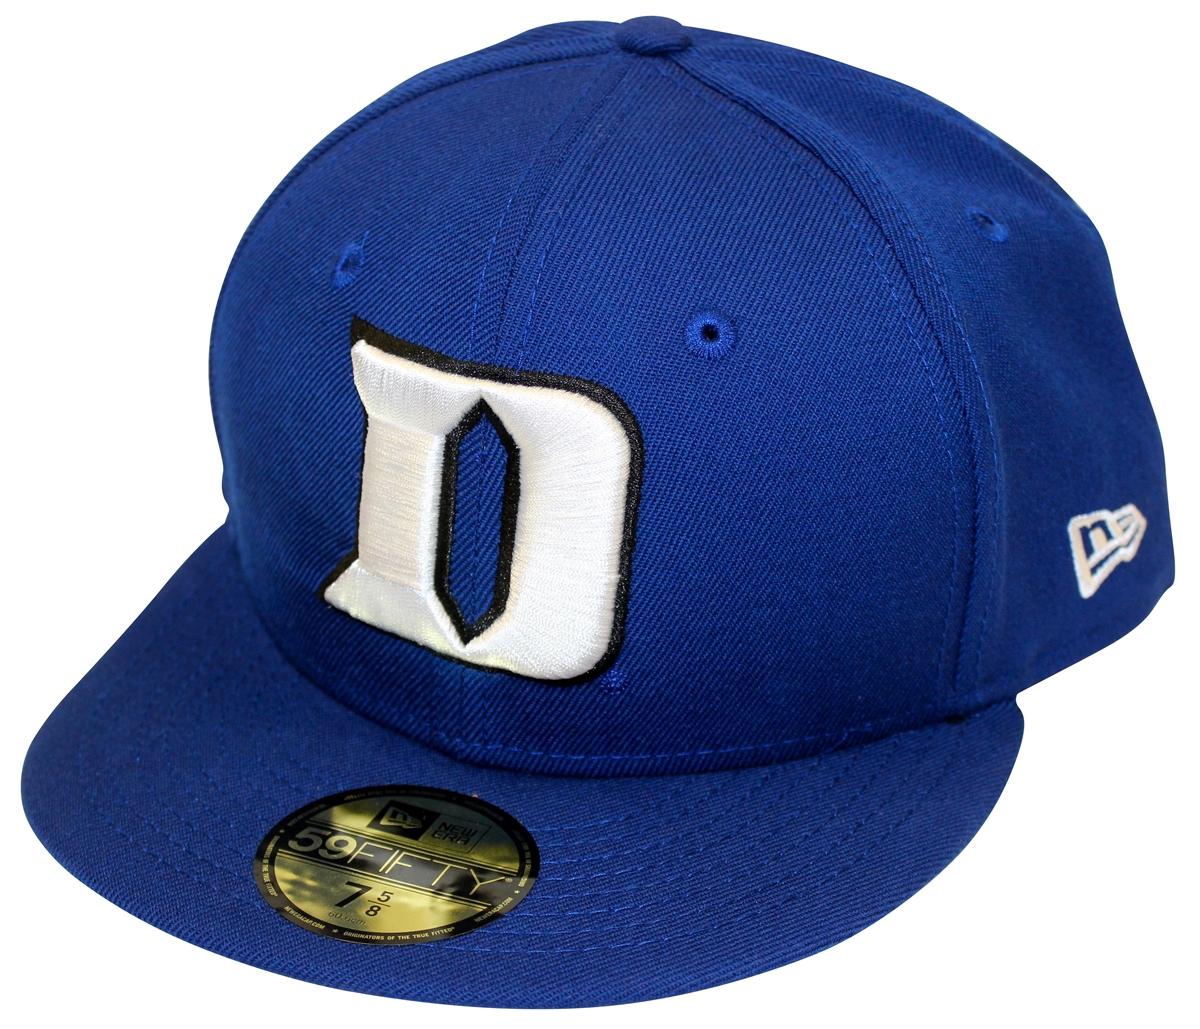 New Era Duke Blue Devils Fitted Cap Hat f2ad3c9b02c